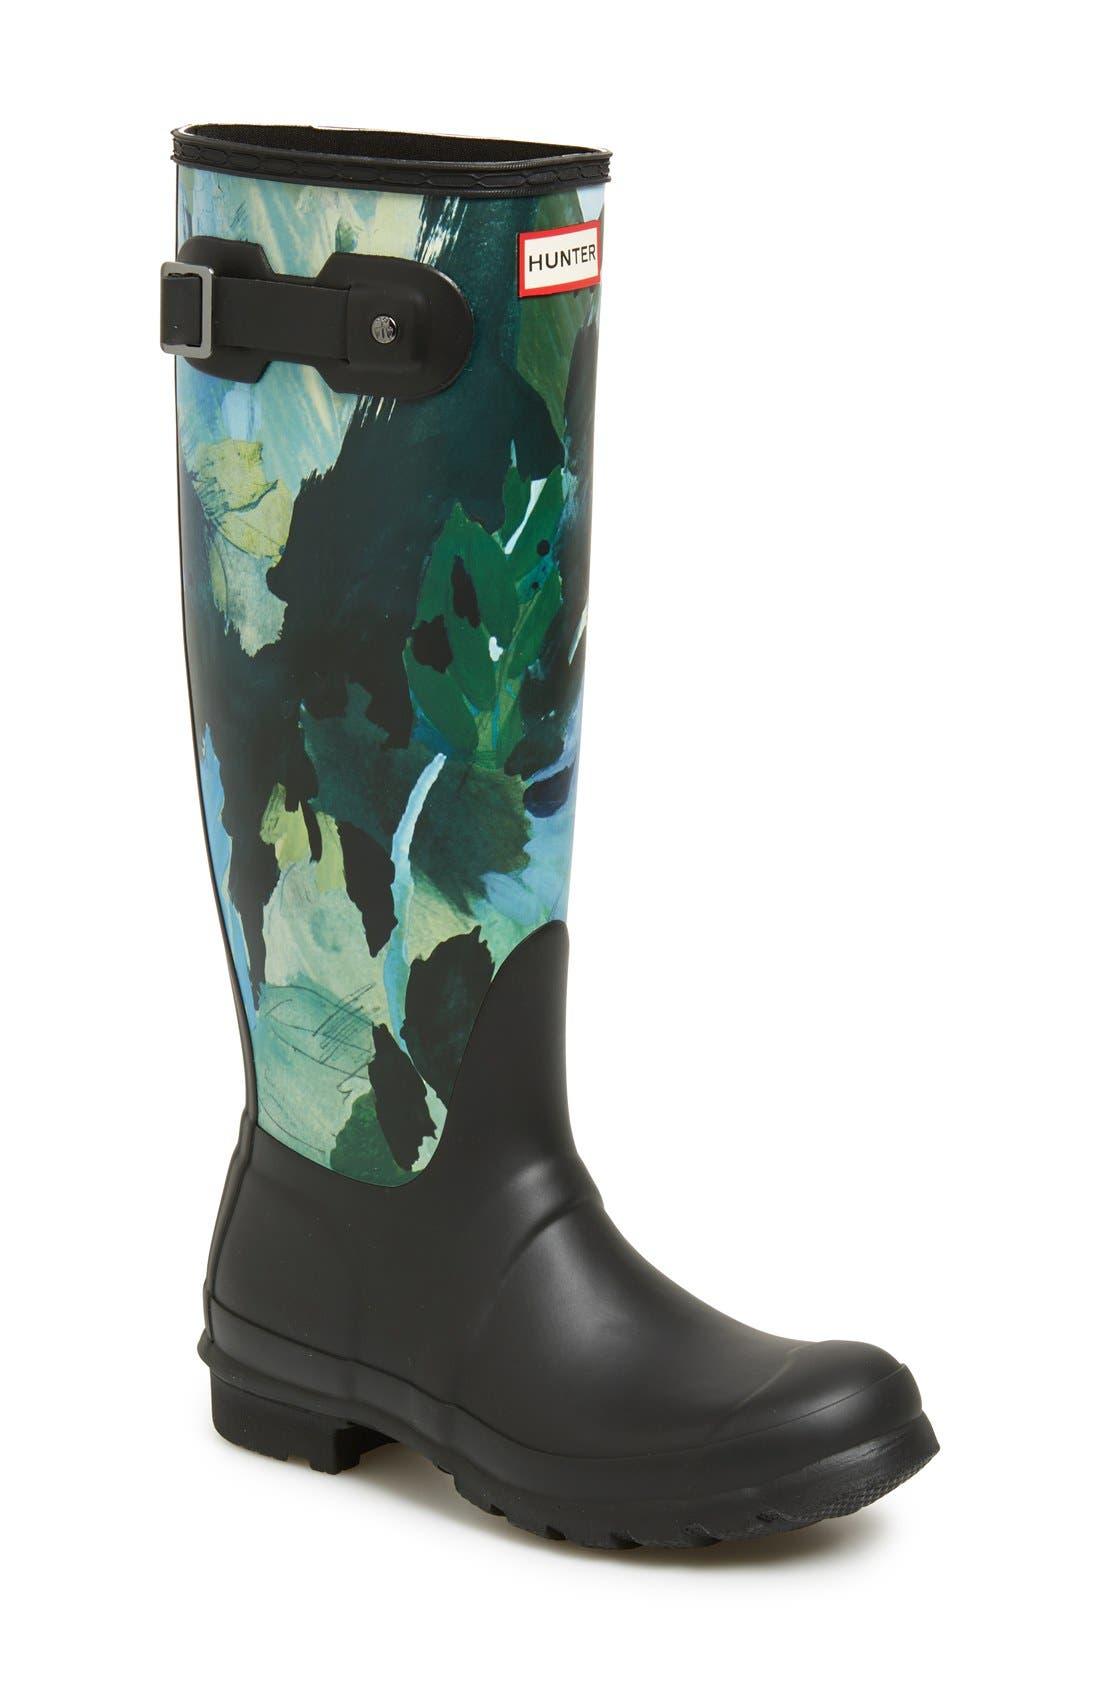 Alternate Image 1 Selected - Hunter 'Original Tall - Botanical' Rain Boot (Women)